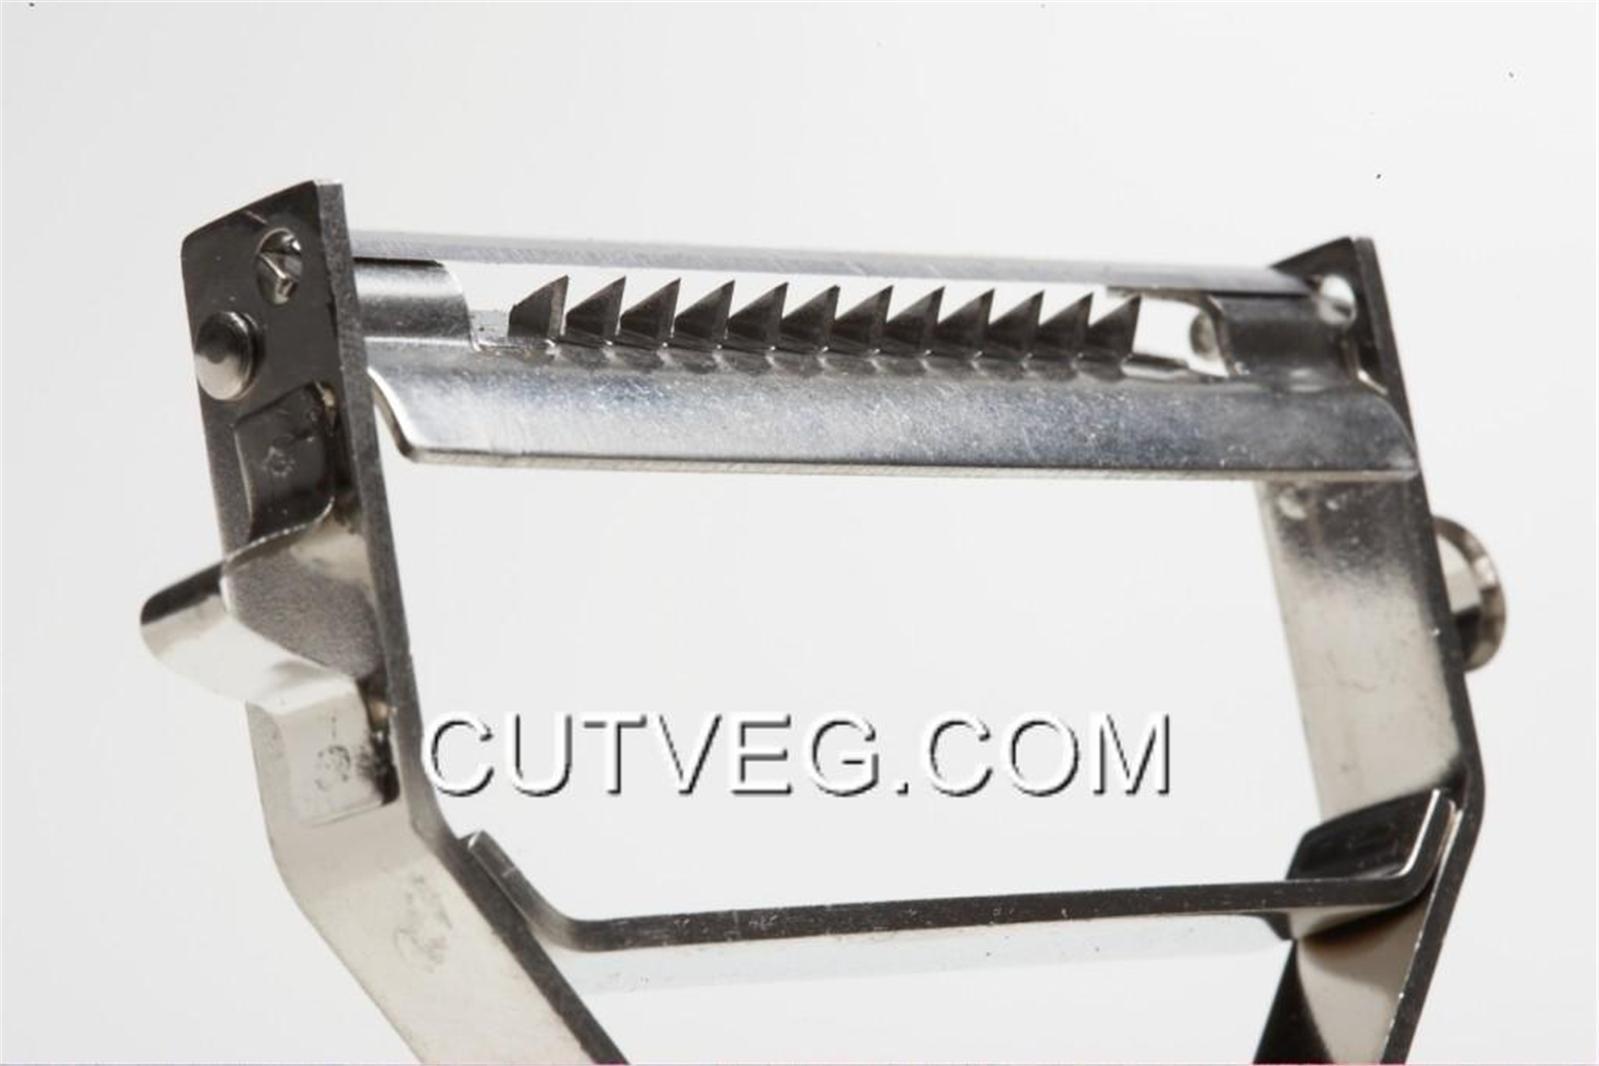 kitchen magician table sets with bench titan julienne cutter as seen on tv cutveg